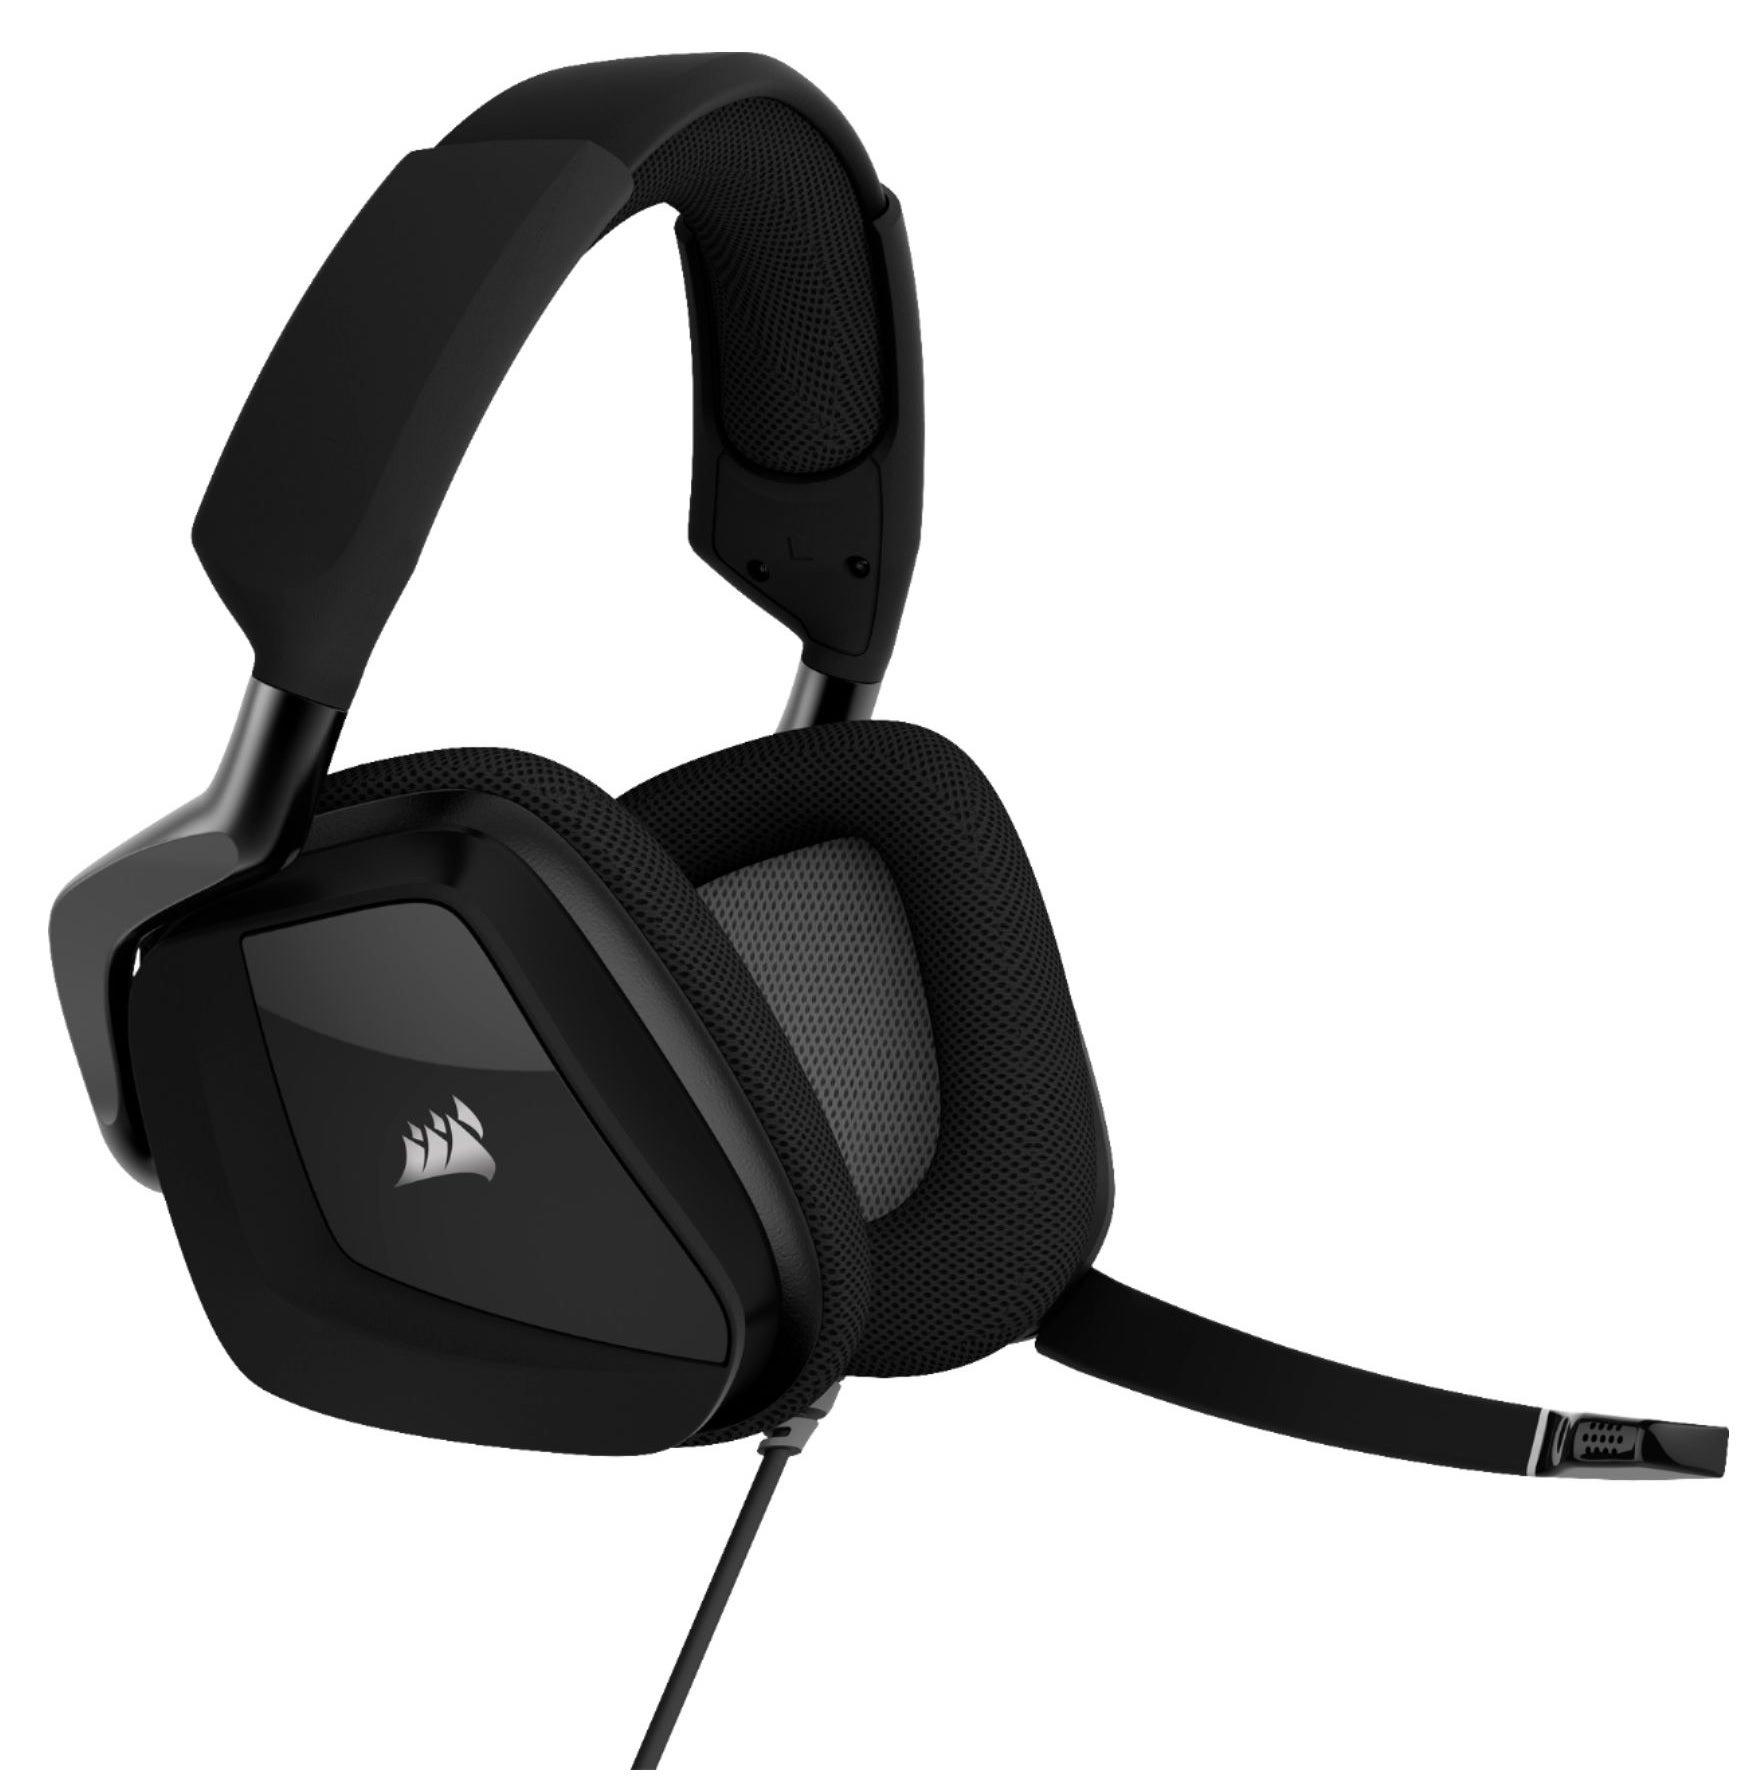 Corsair Void Elite Wired Headphones